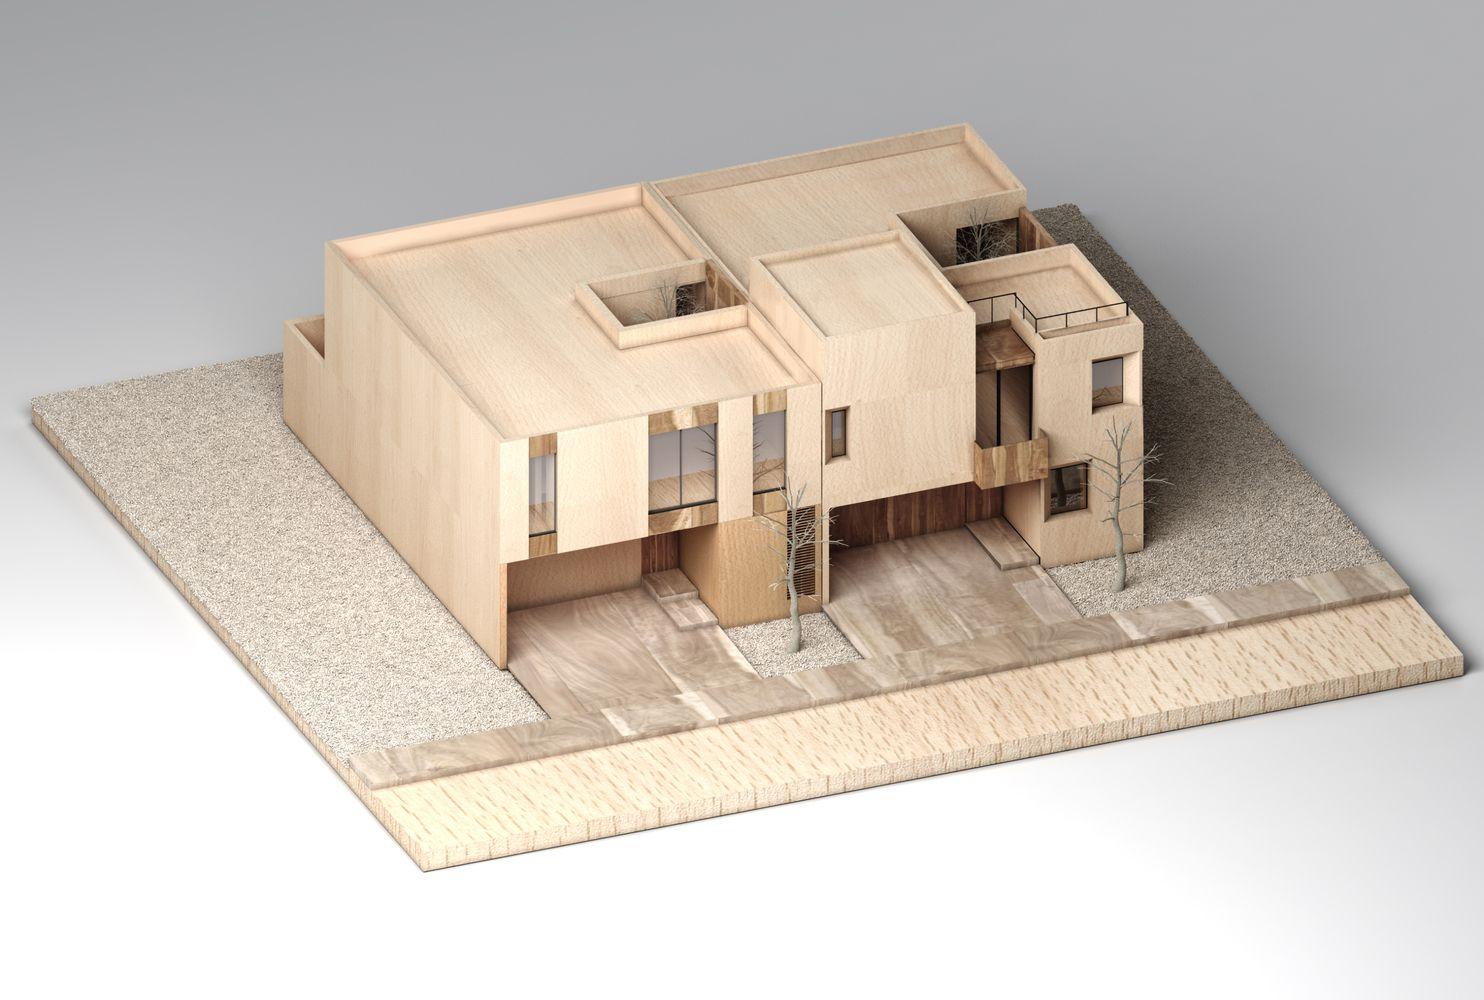 Gallery Of Sole Houses Santoscreativos Vtaller 16 Architecture Model Model Building House